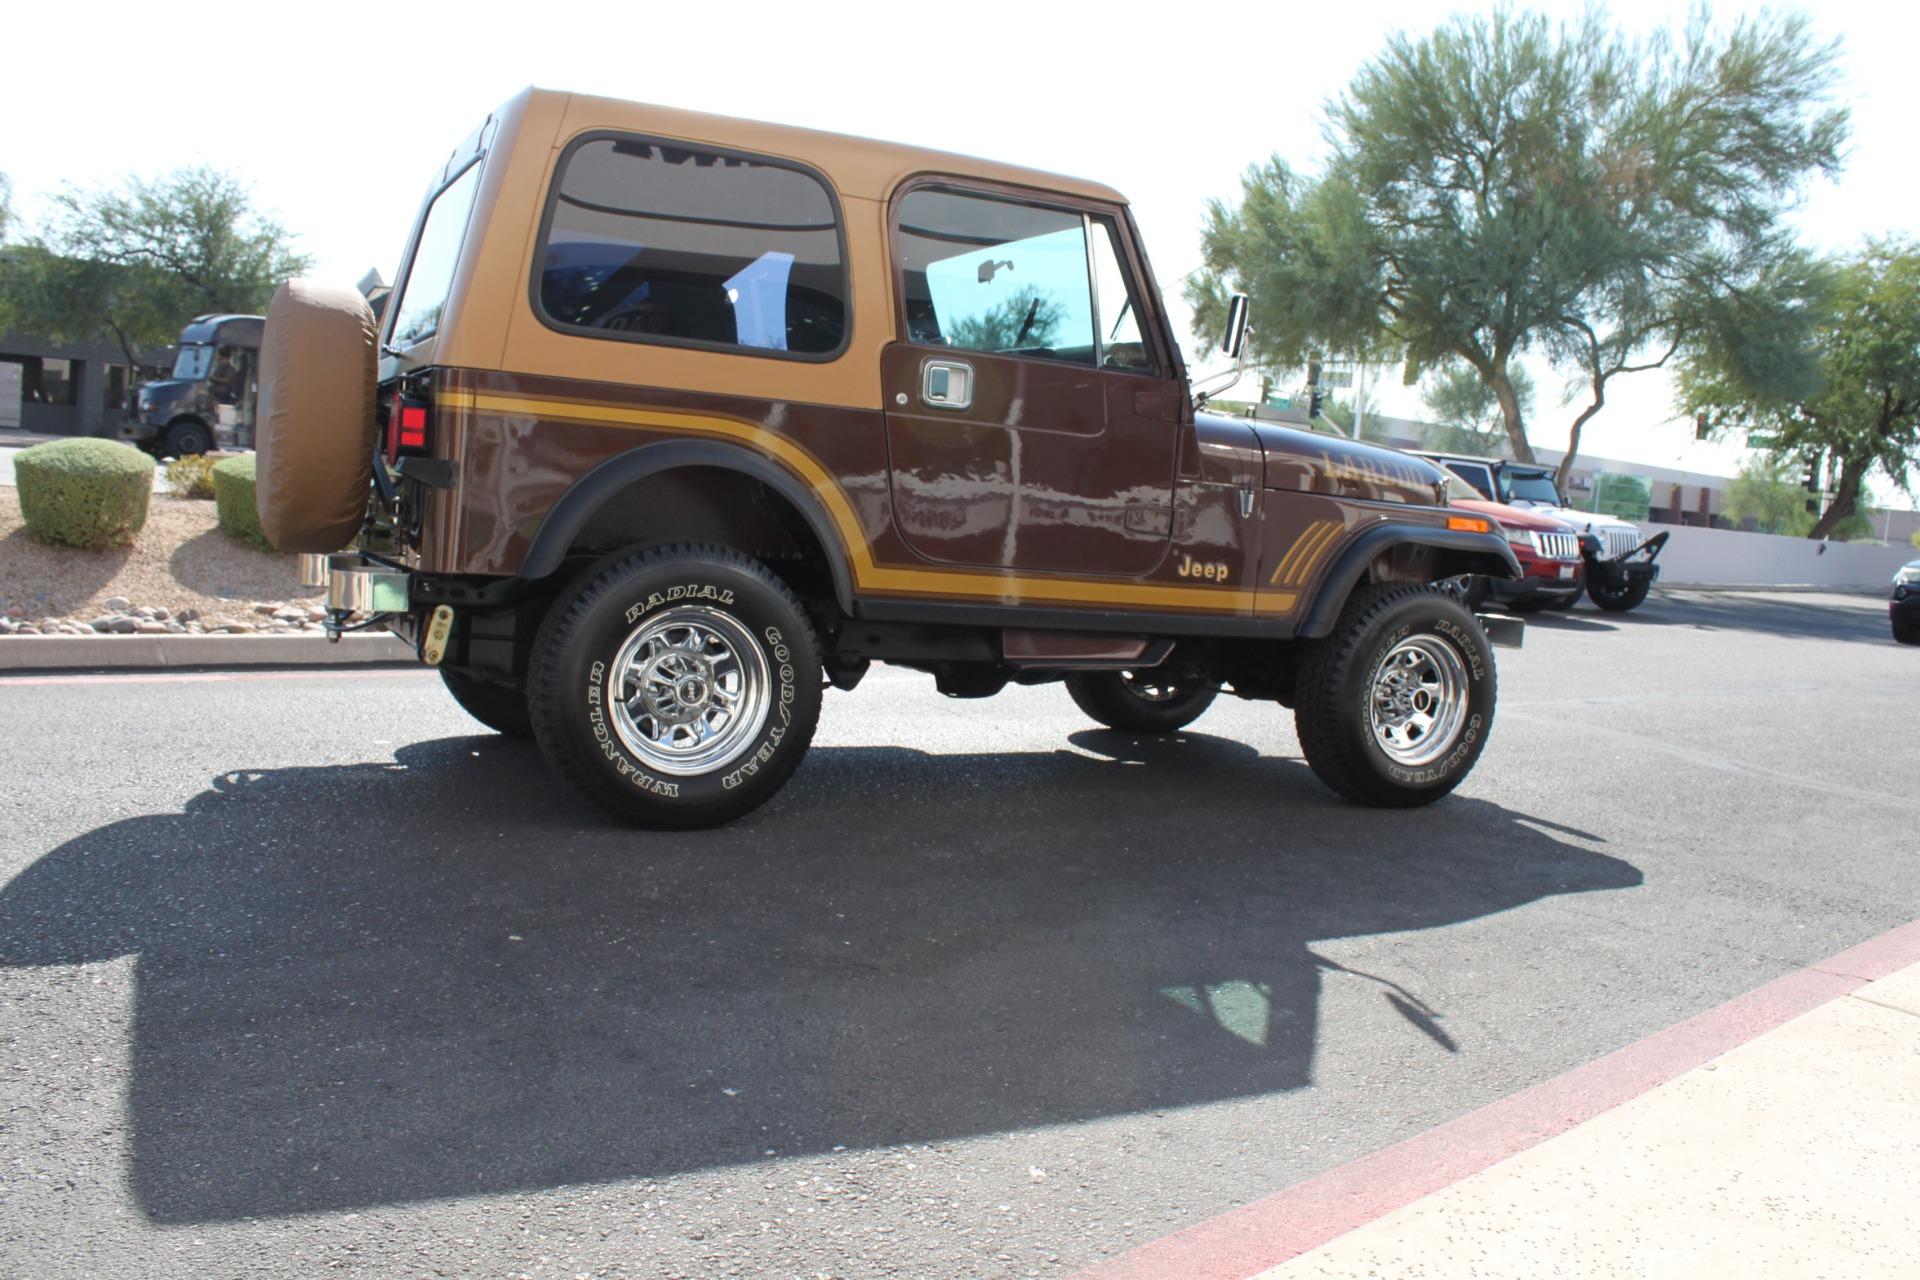 Used-1985-Jeep-CJ-7-Laredo-4WD-Toyota